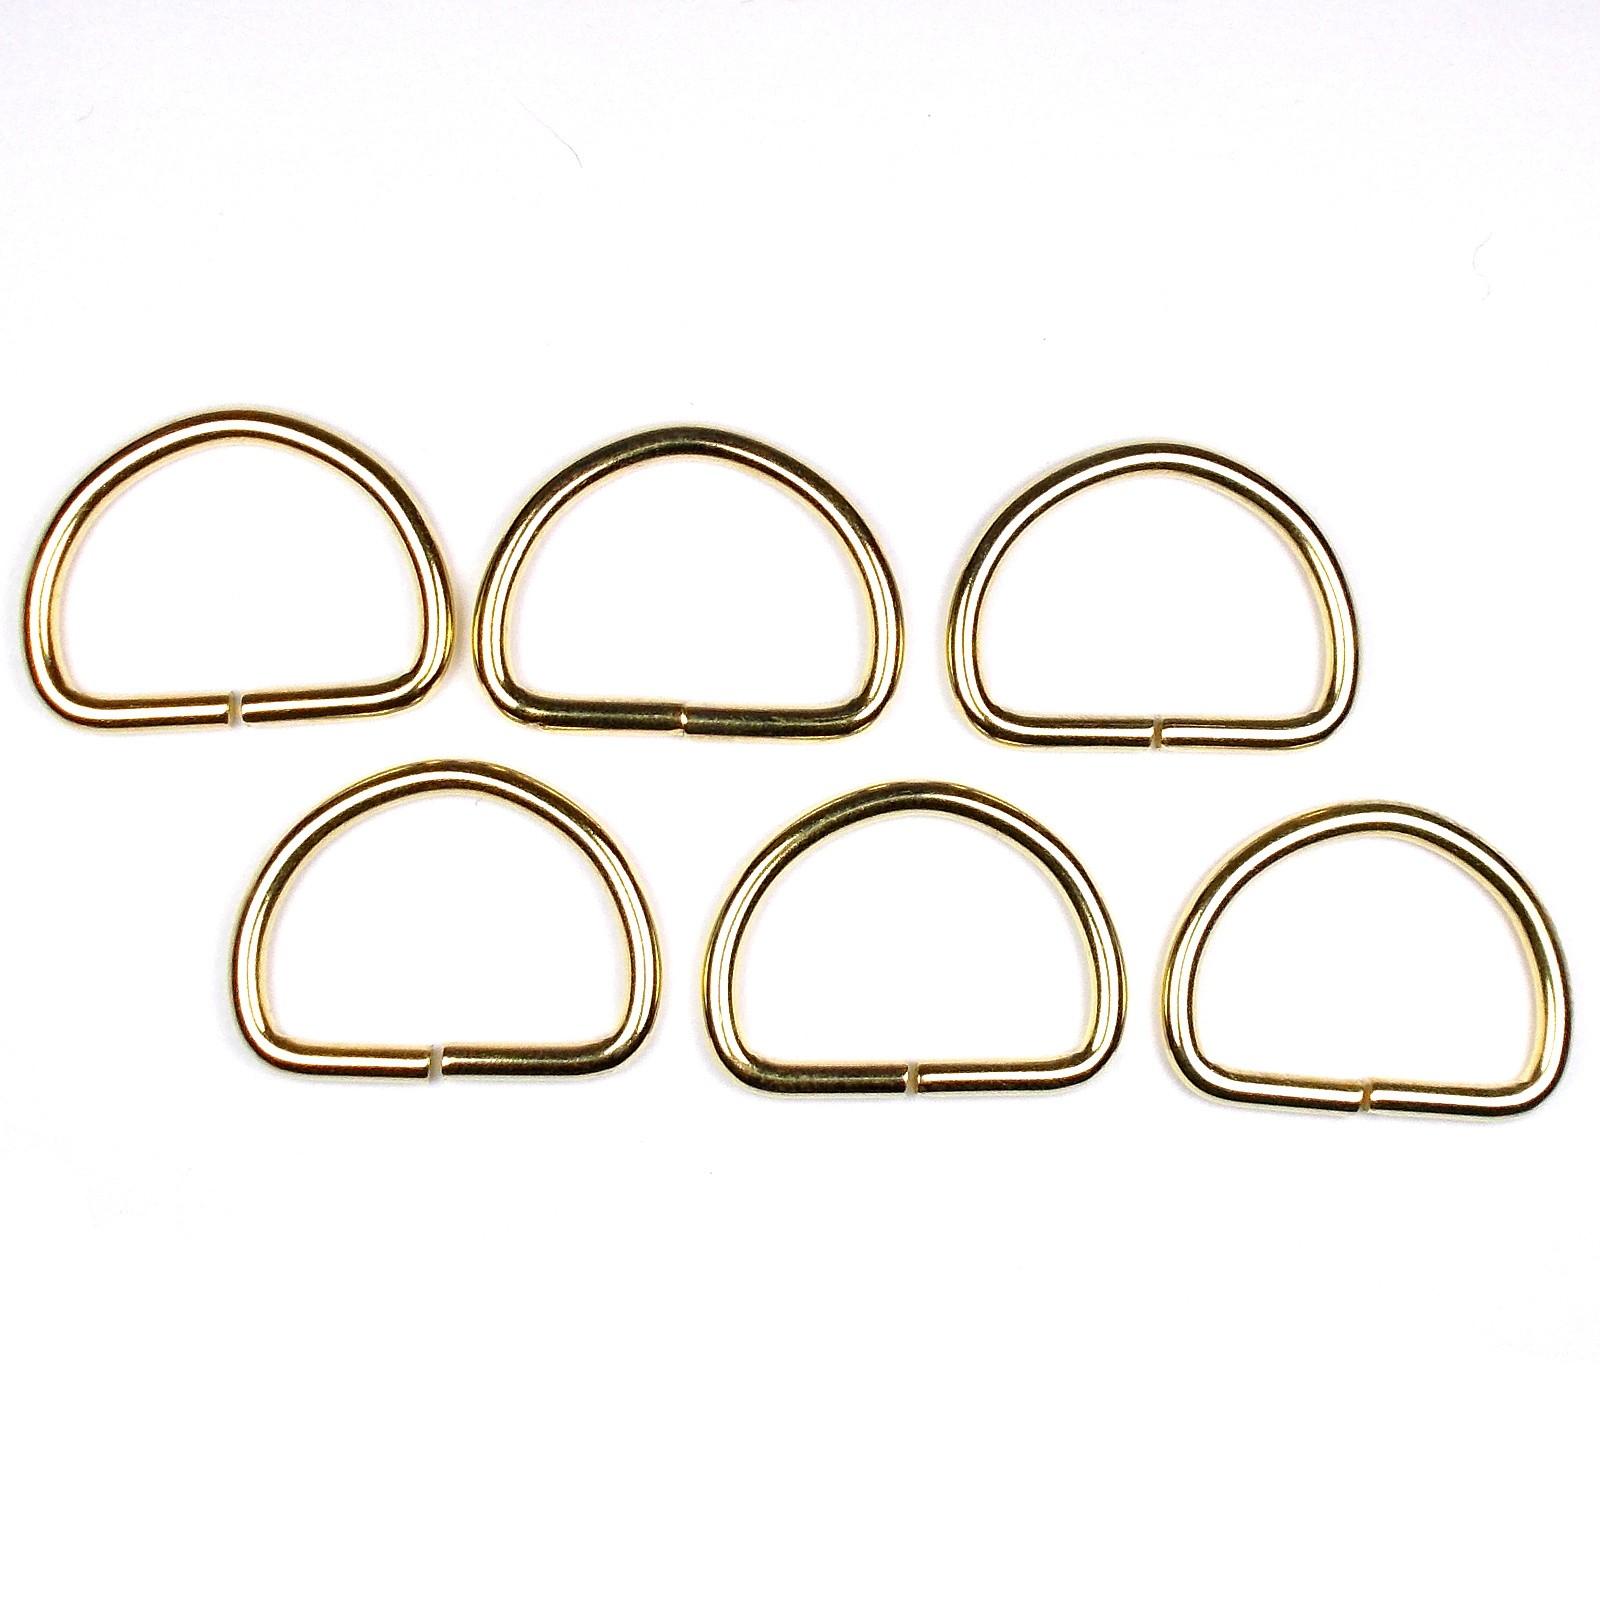 Gold Metal D Rings 33mm Pack of 6